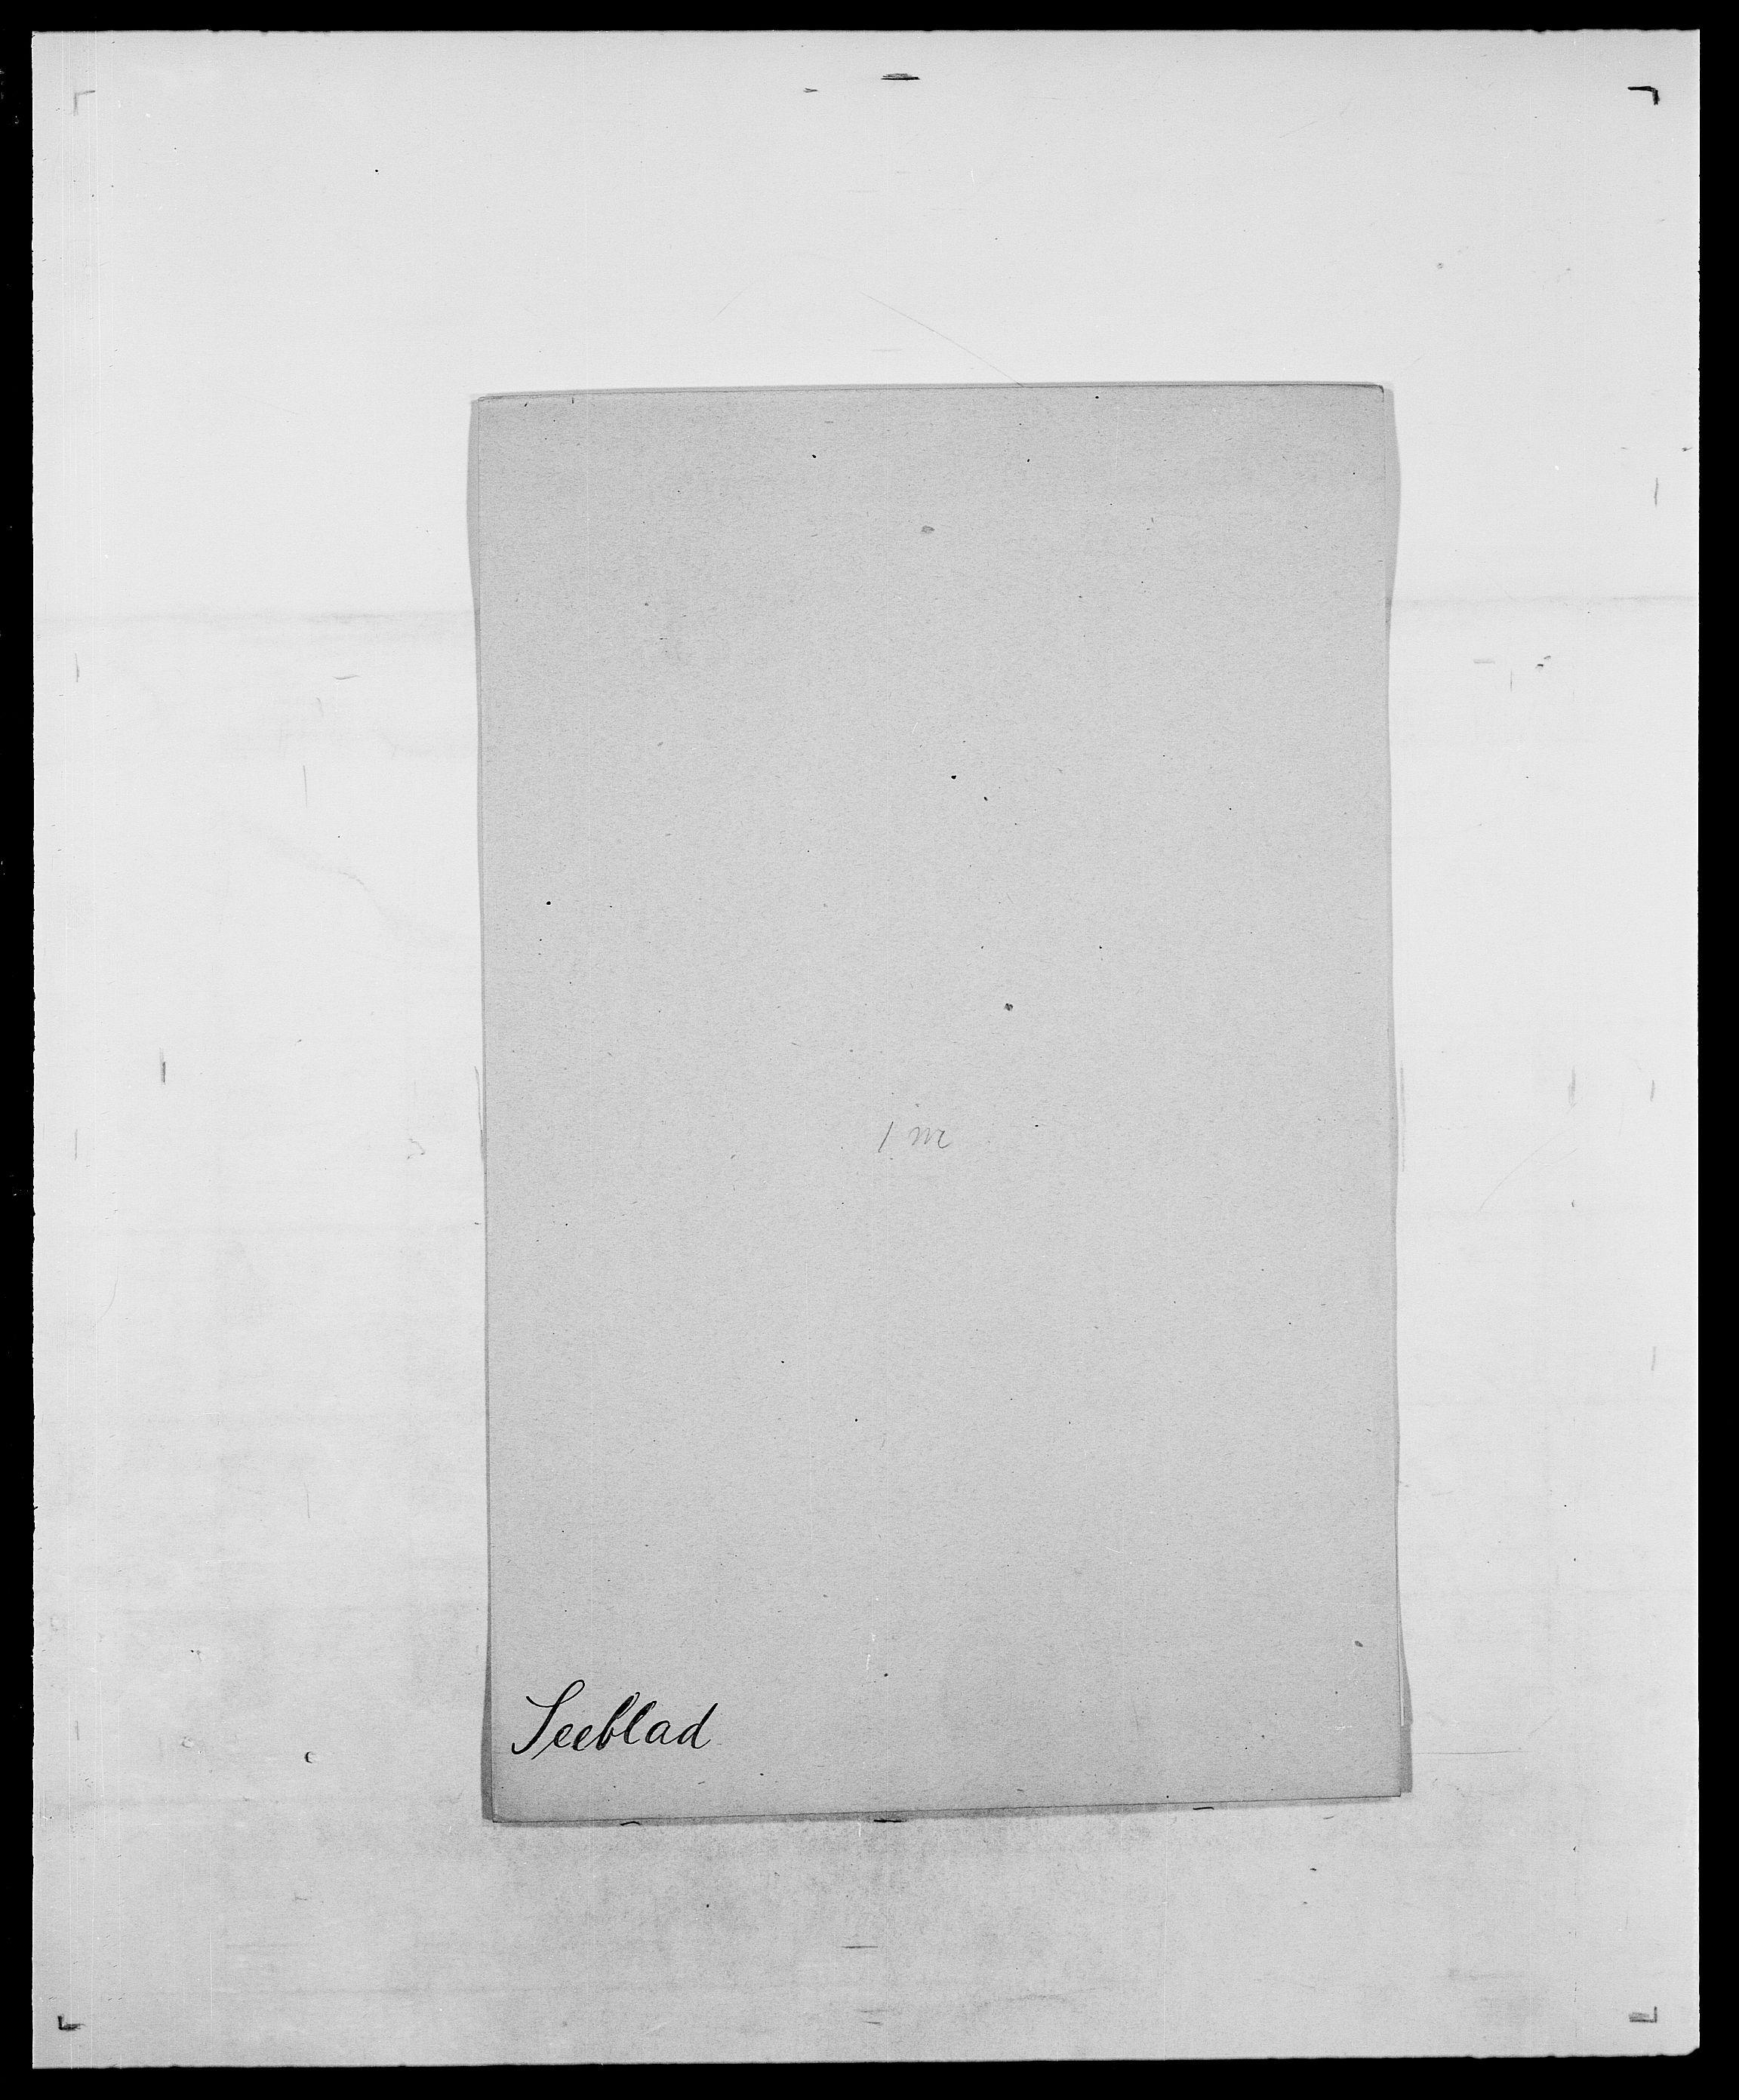 SAO, Delgobe, Charles Antoine - samling, D/Da/L0035: Schnabel - sjetman, s. 535